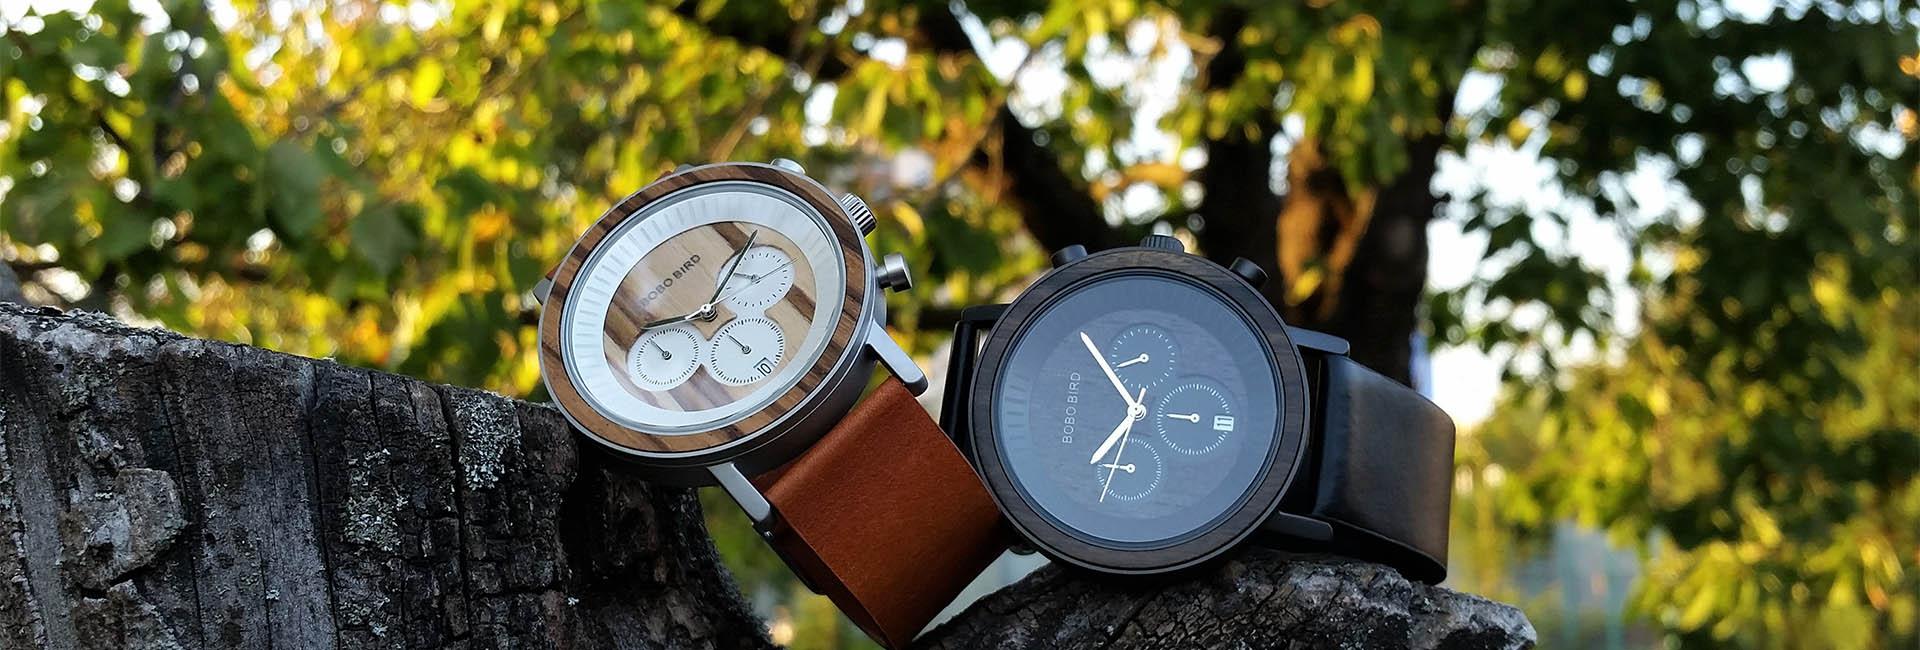 kategoria-muzi-drevene-hodinky-vini